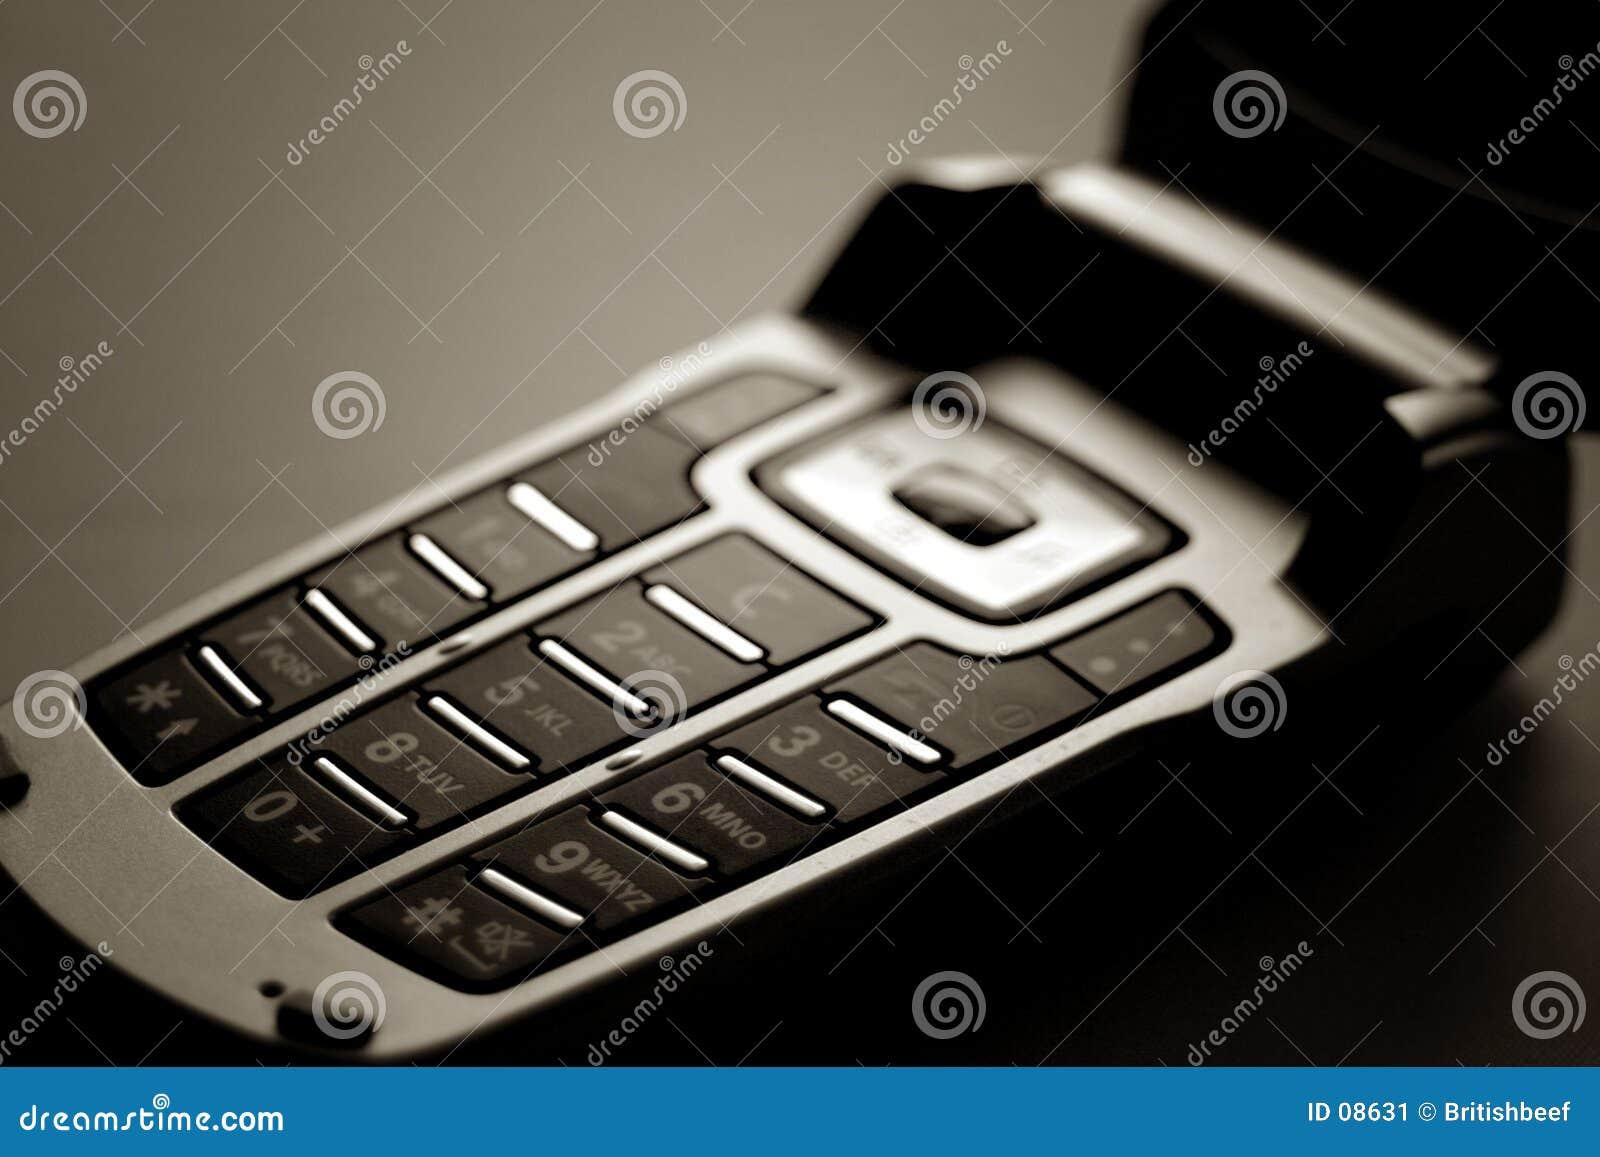 Cellmobiltelefon